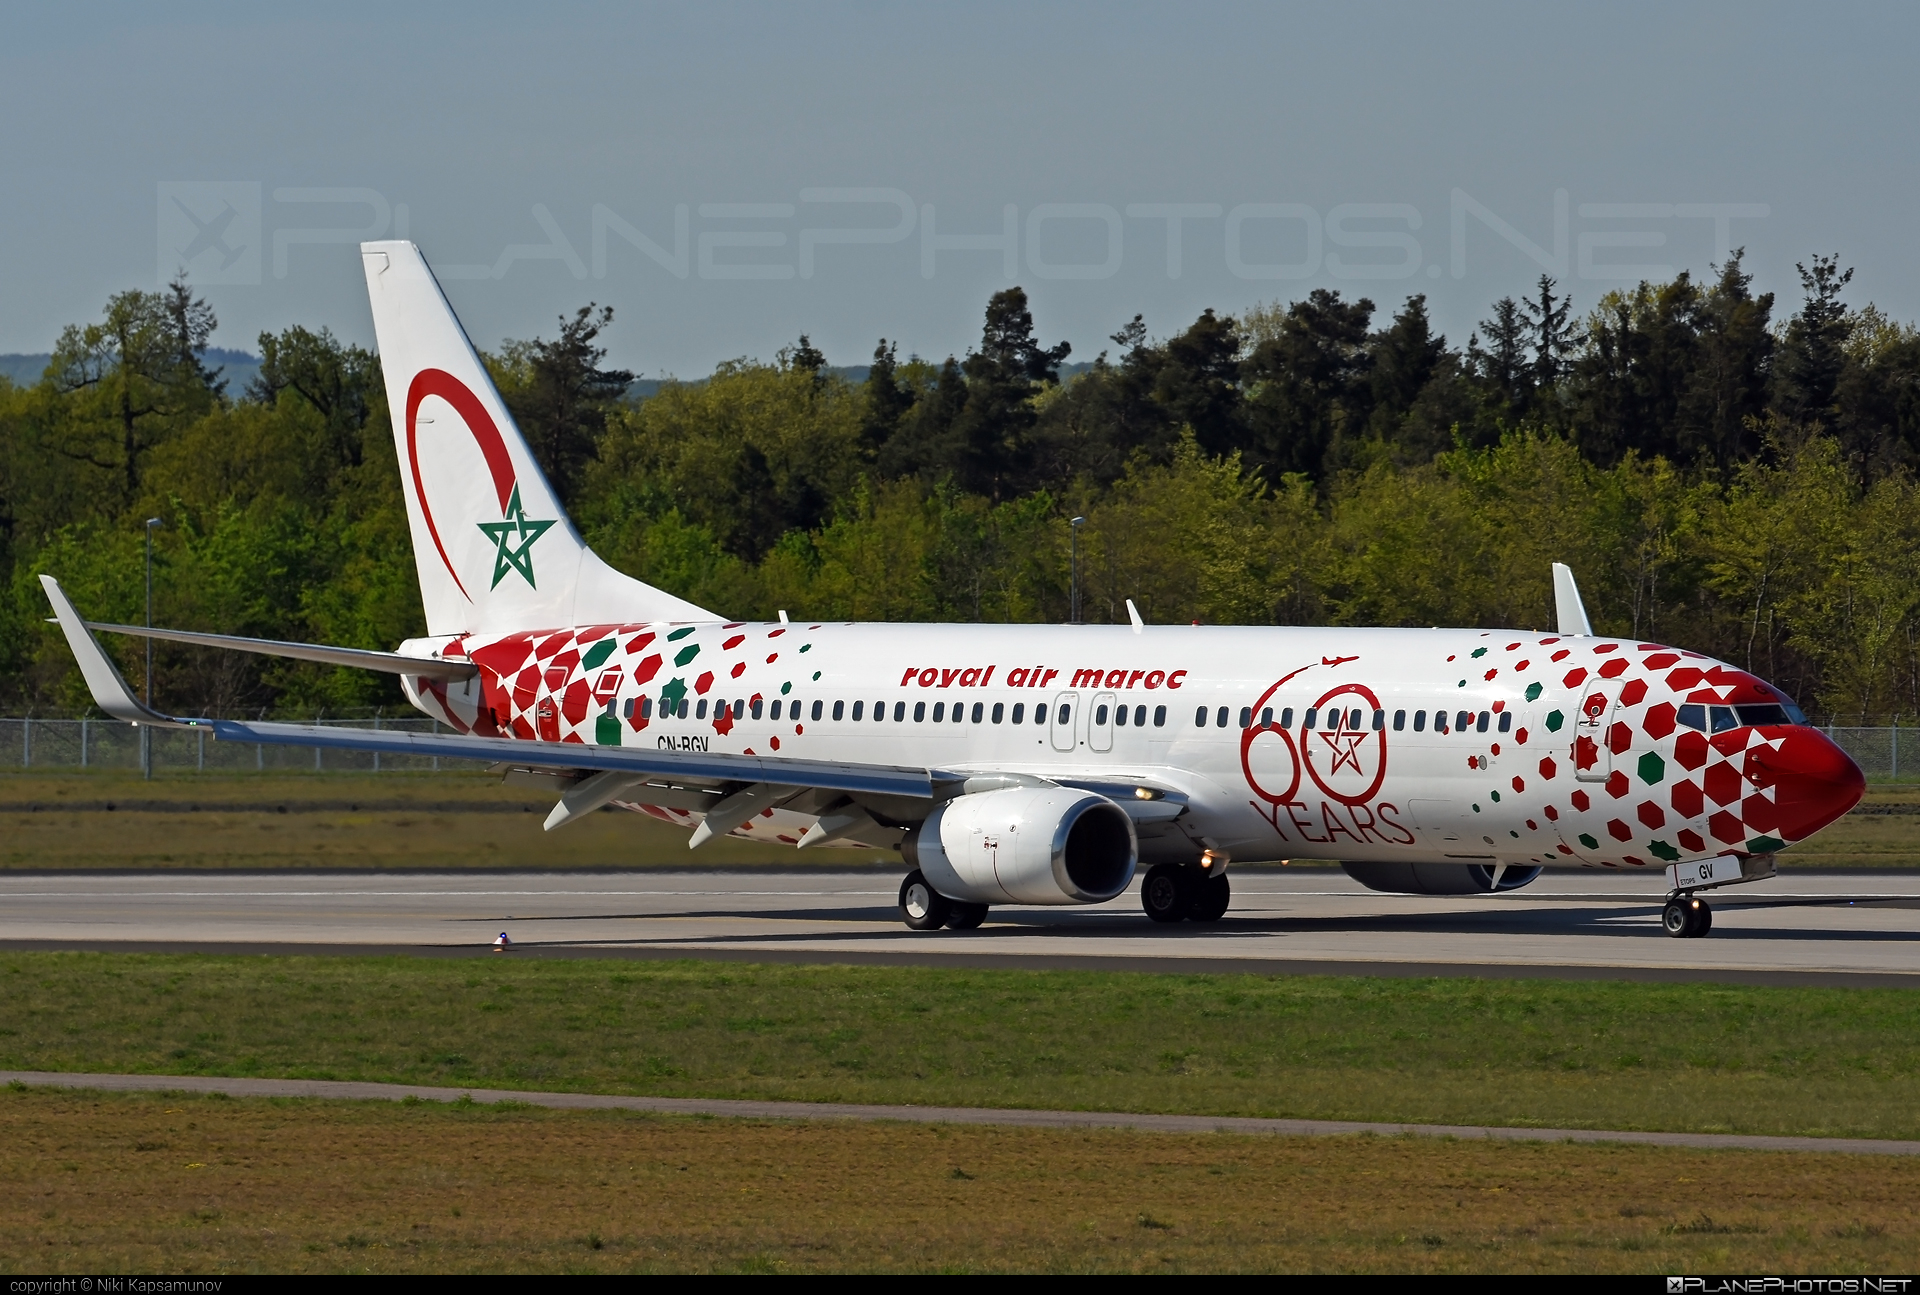 Boeing 737-800 - CN-RGV operated by Royal Air Maroc (RAM) #b737 #b737nextgen #b737ng #boeing #boeing737 #royalairmaroc